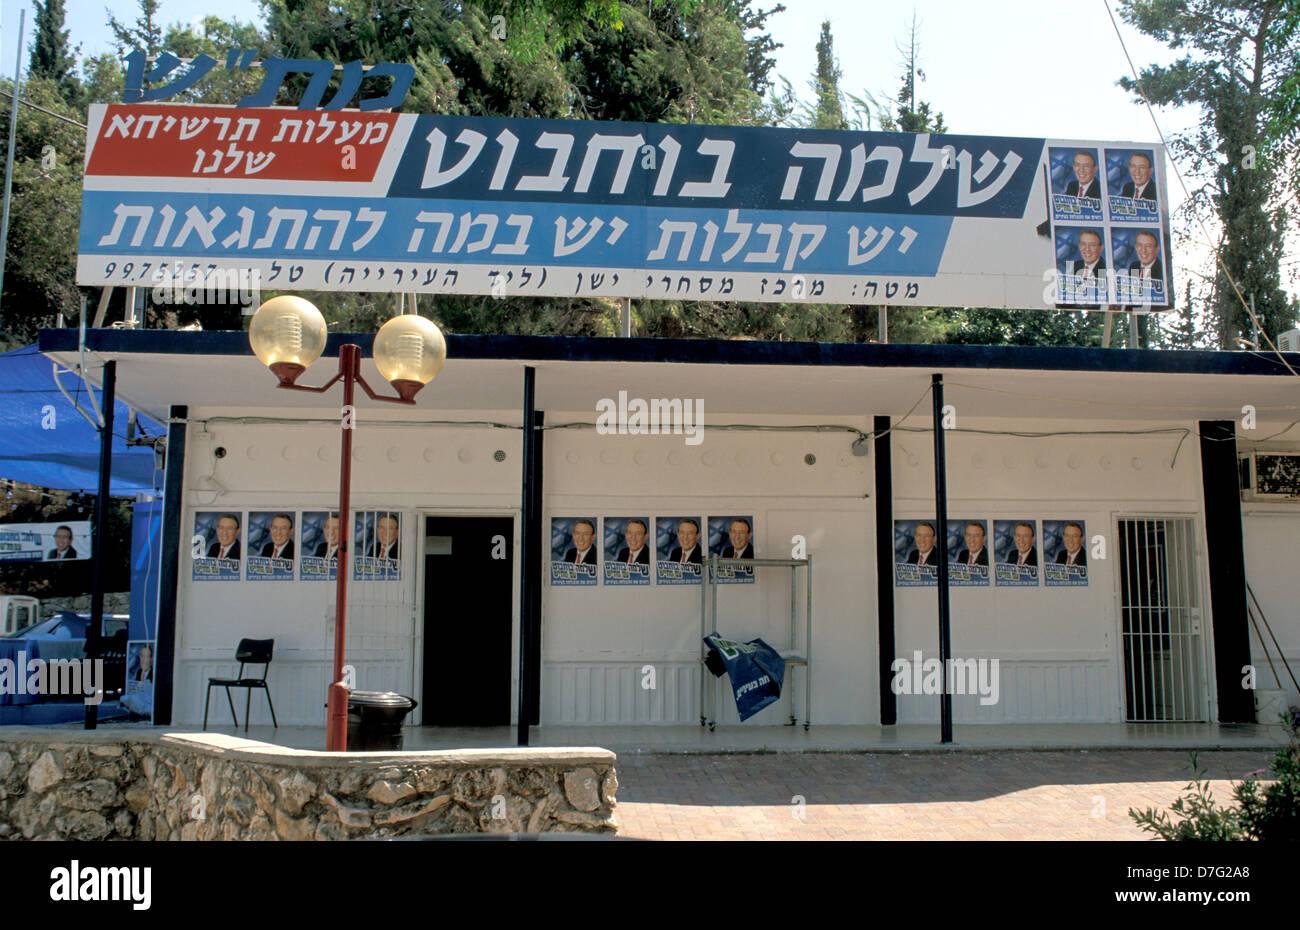 2003 elecciones en maalot tarshiha municality publicidad para alcalde shlomo buchbut Imagen De Stock